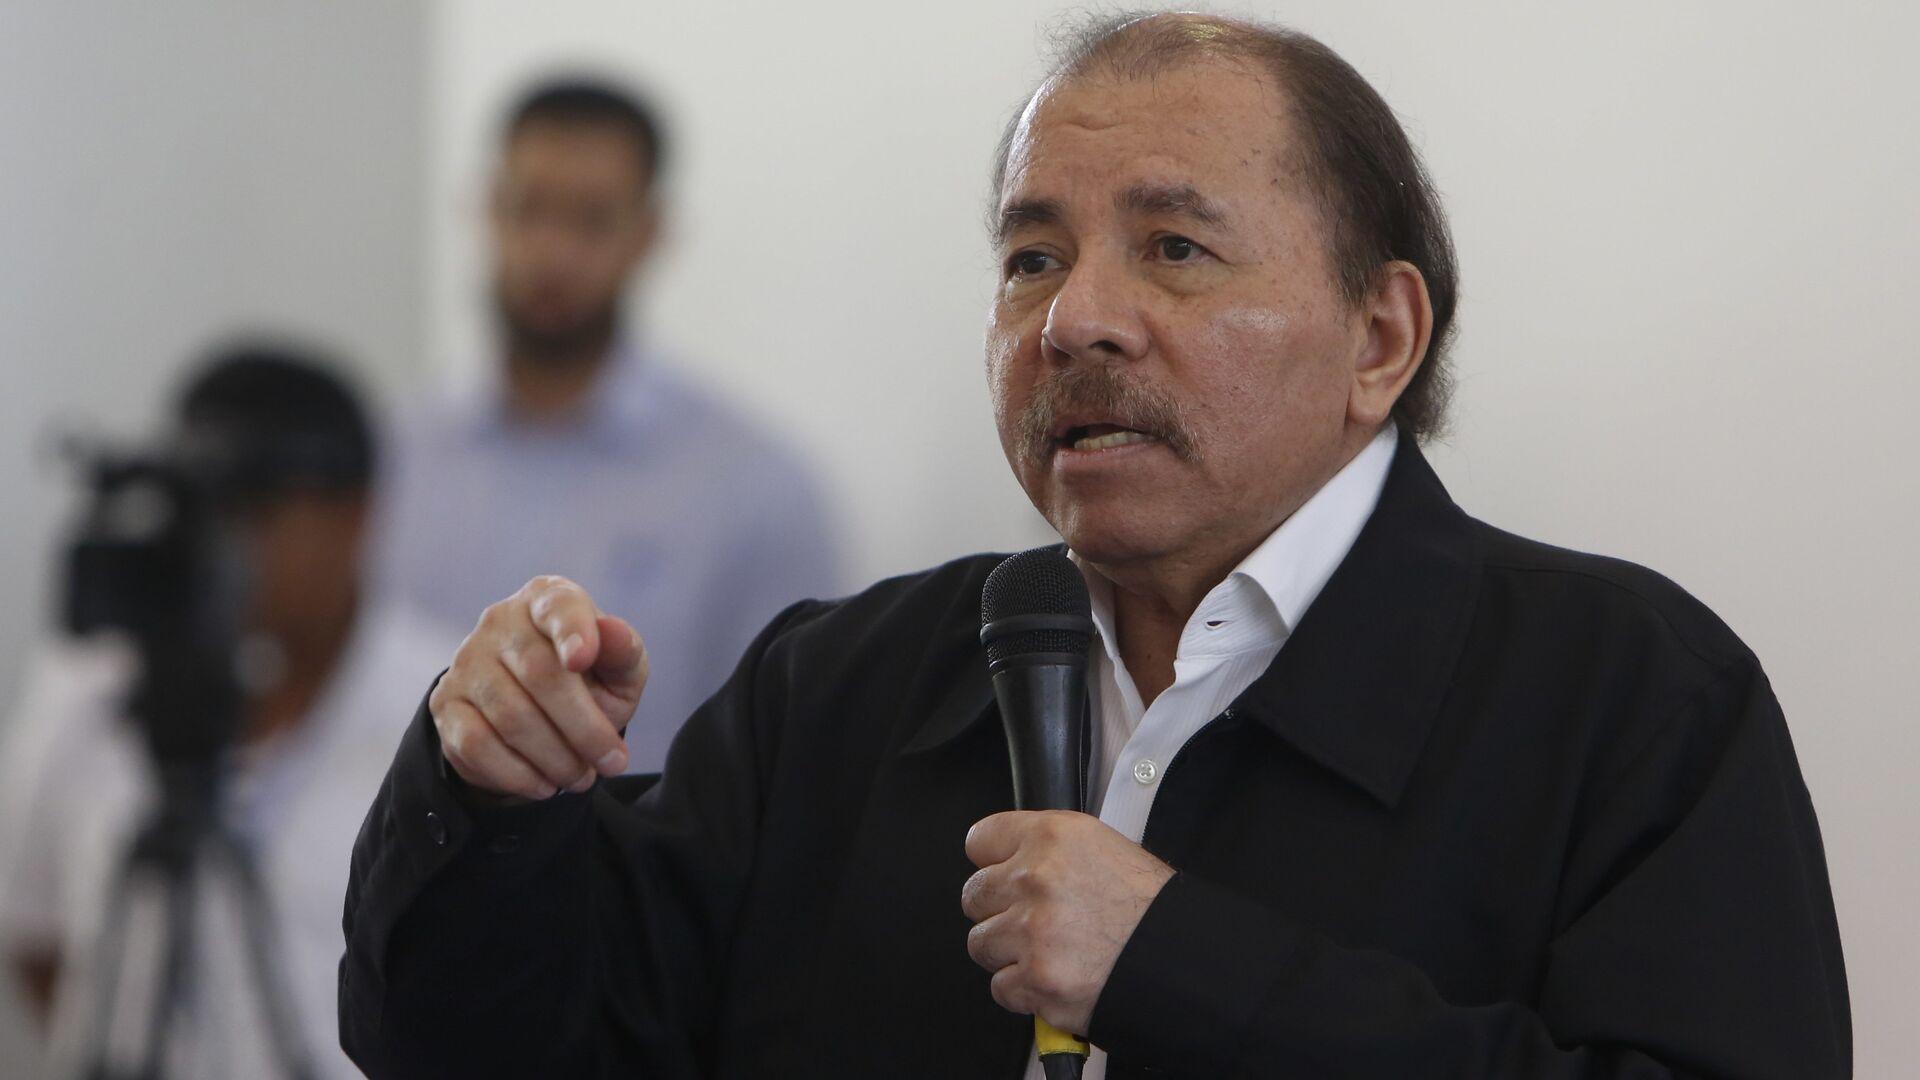 Daniel Ortega, presidente de Nicaragua  - Sputnik Mundo, 1920, 24.04.2021